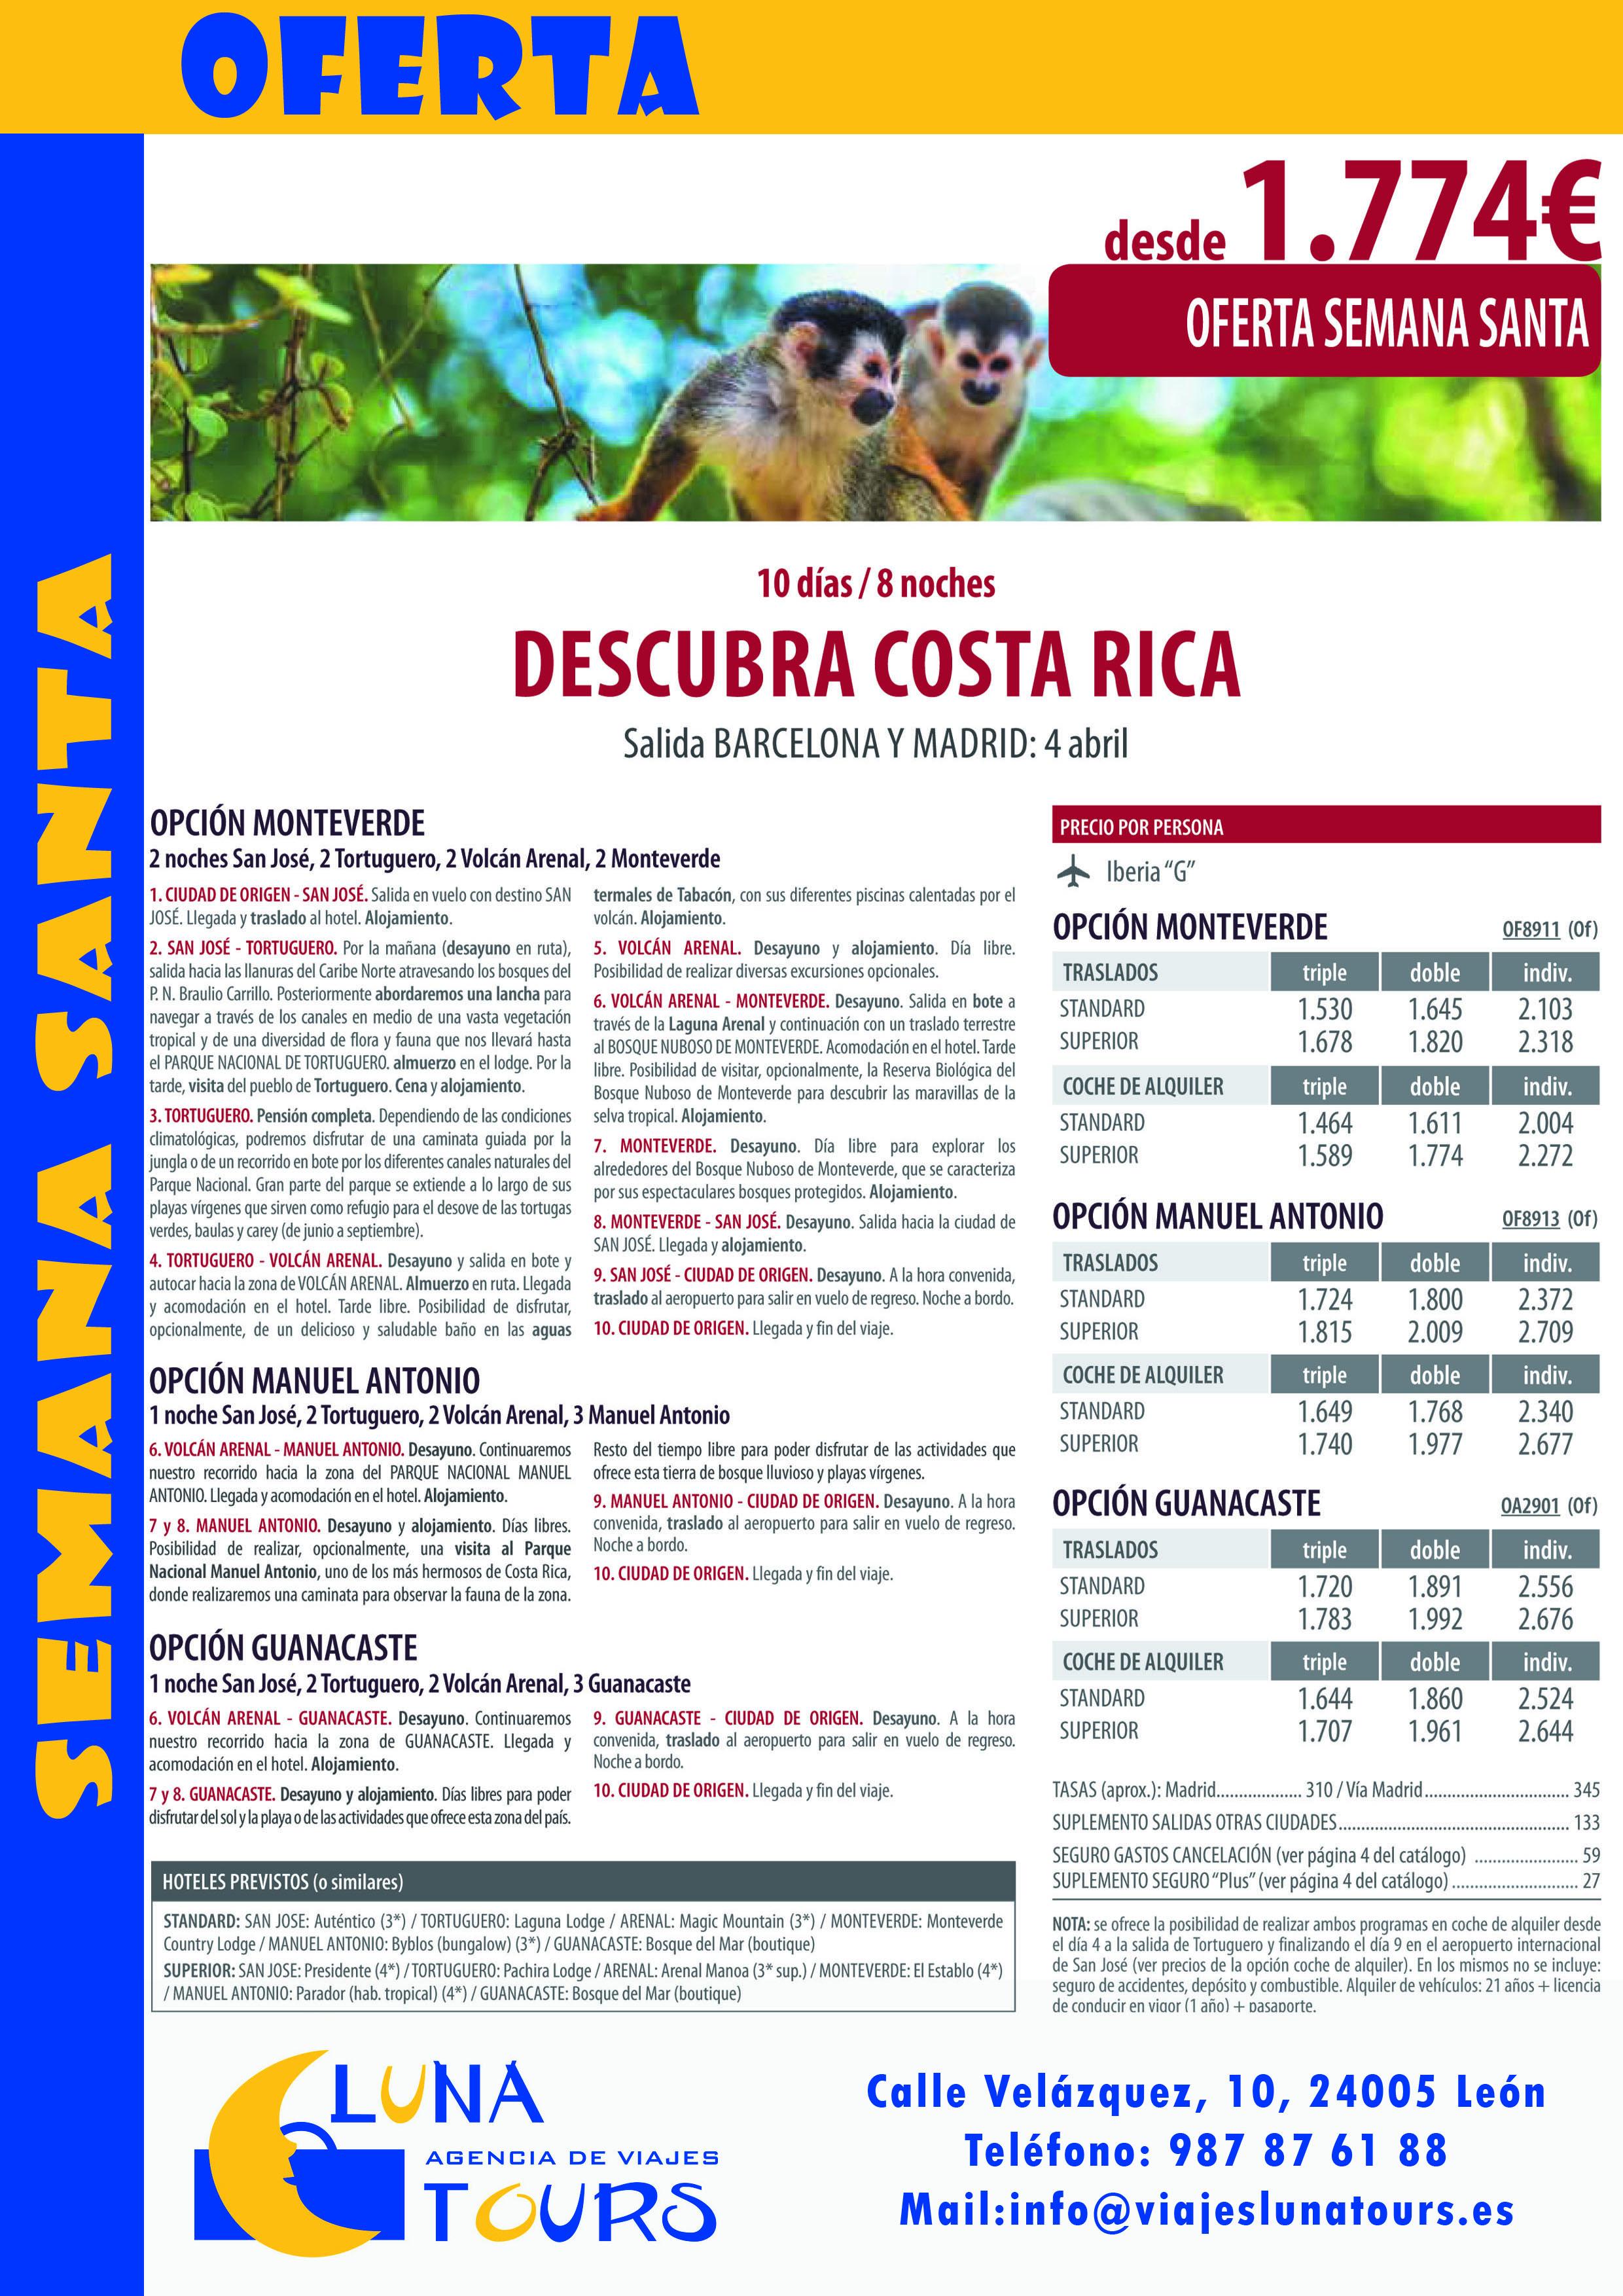 COSTA RICA SEMANA SANTA